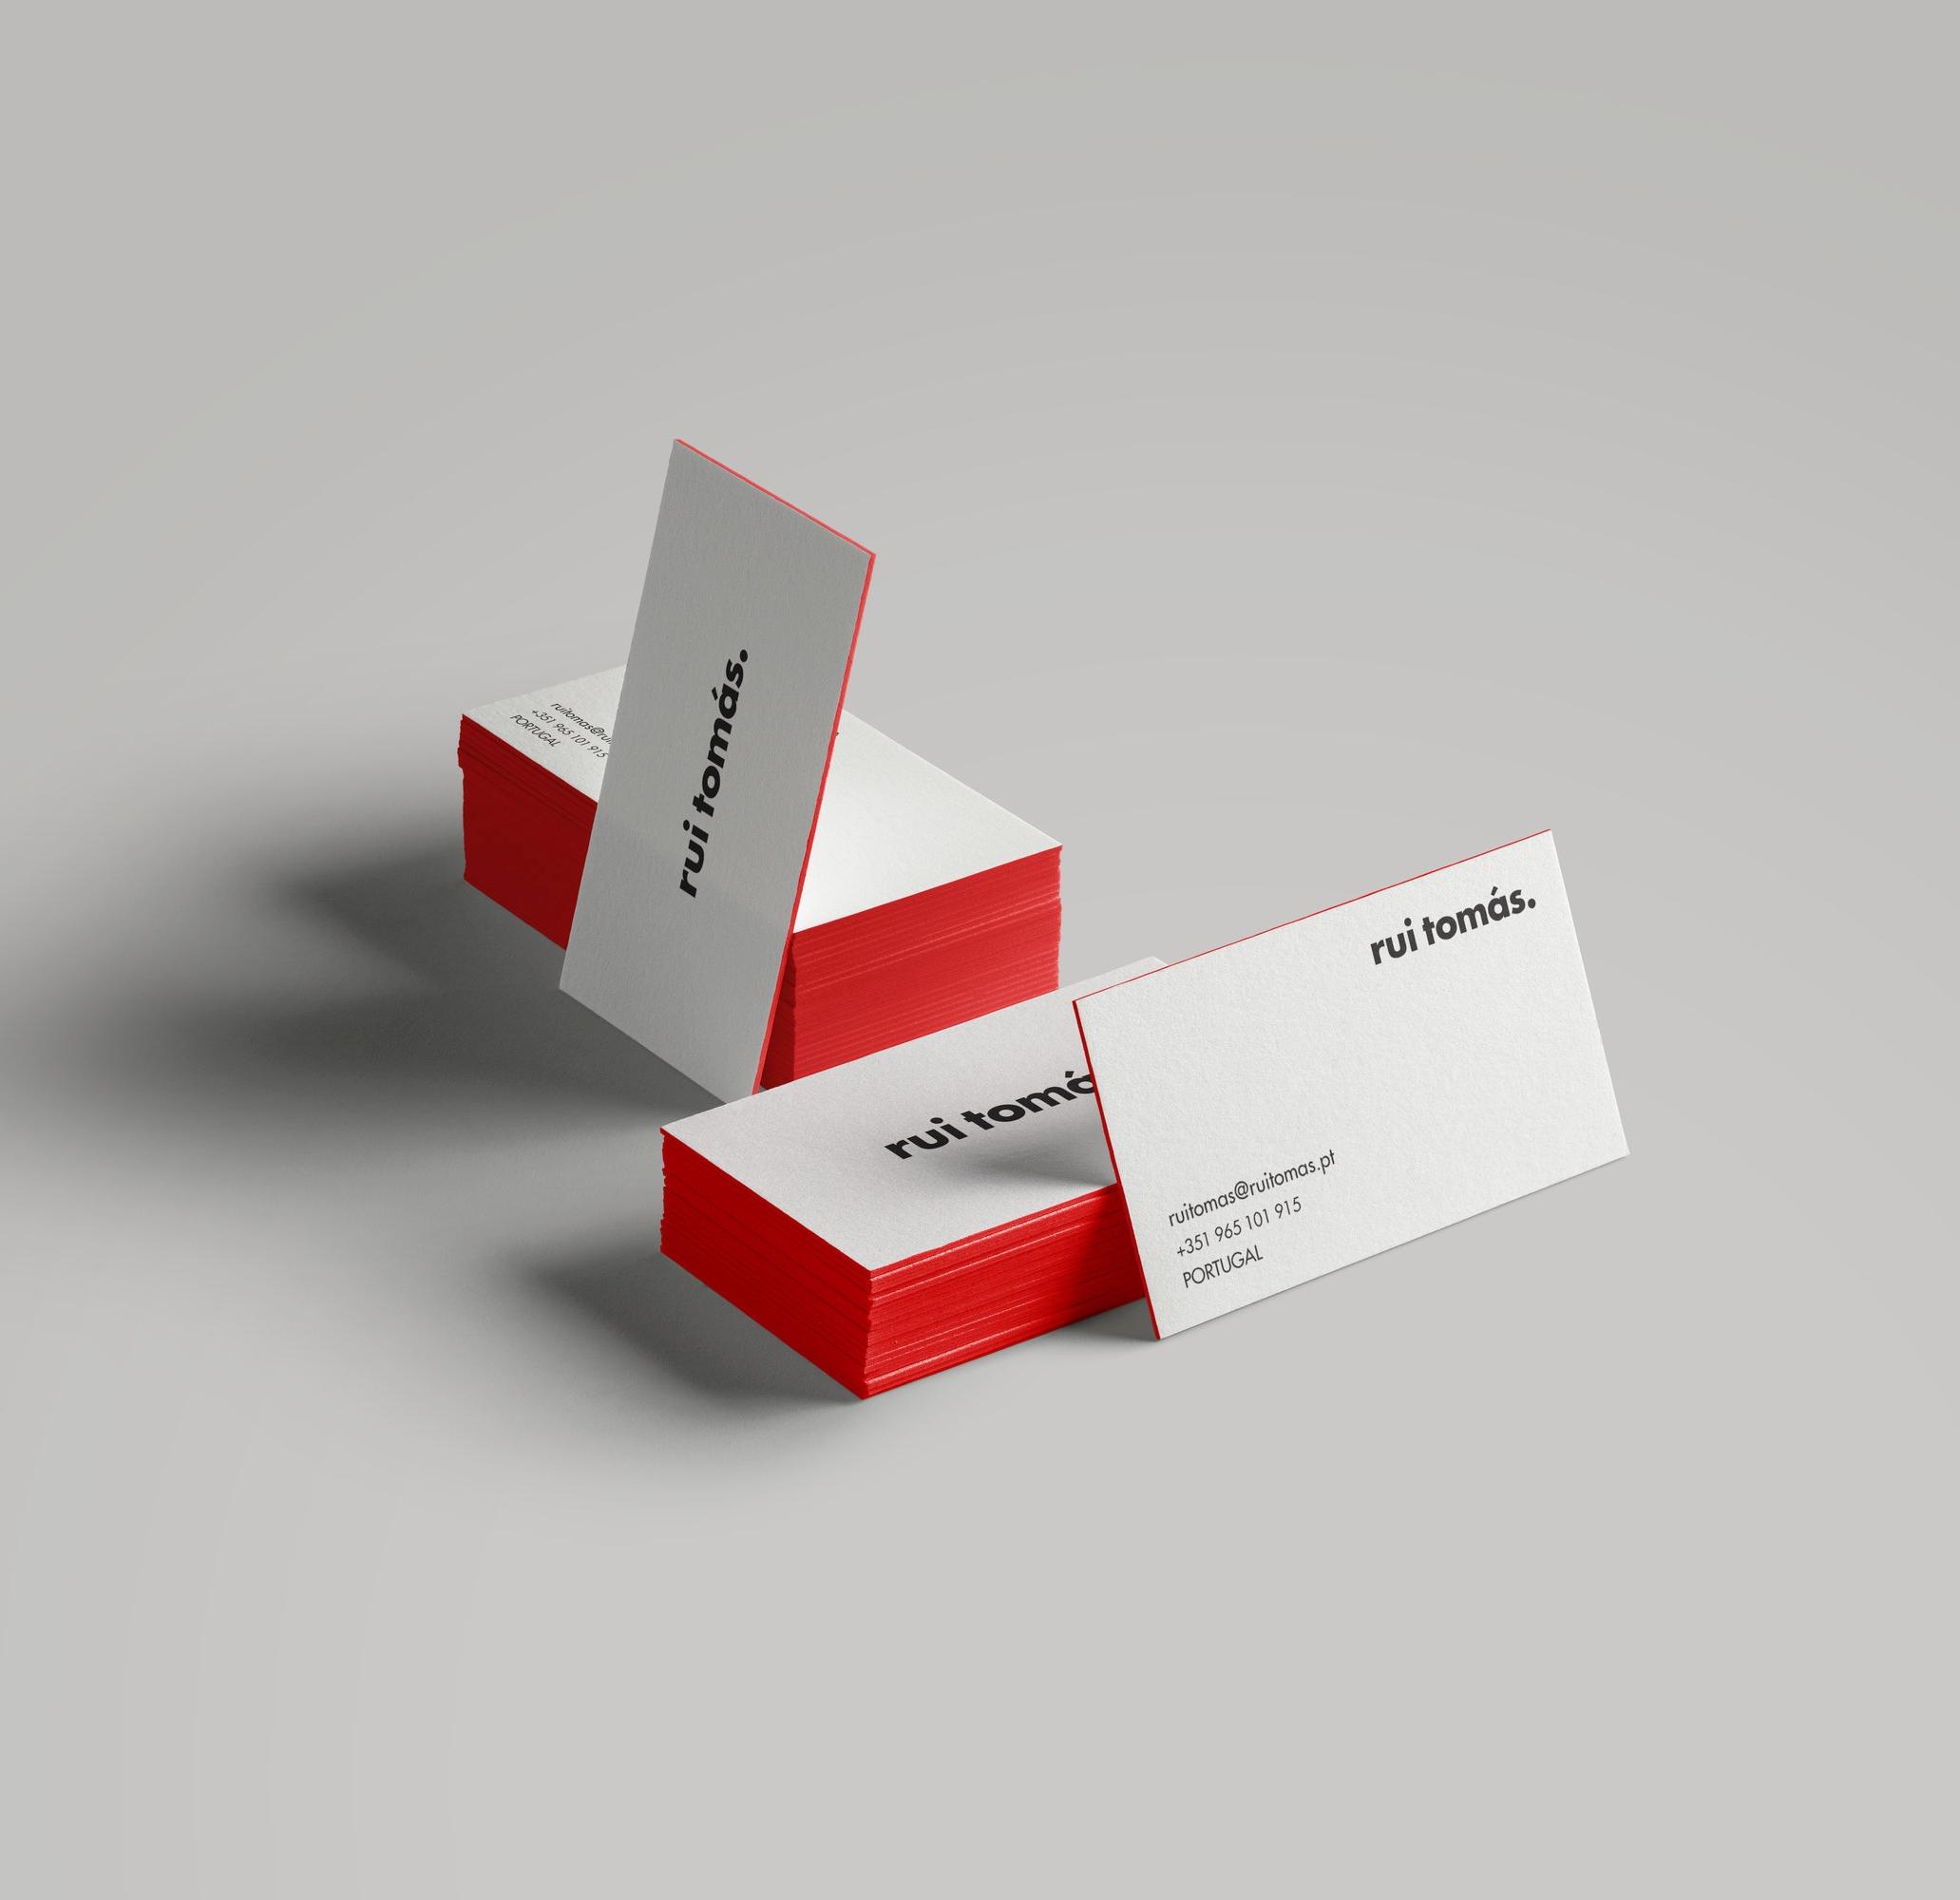 Business-Card-Brand-Mockup-RUI TOMAS.jpg